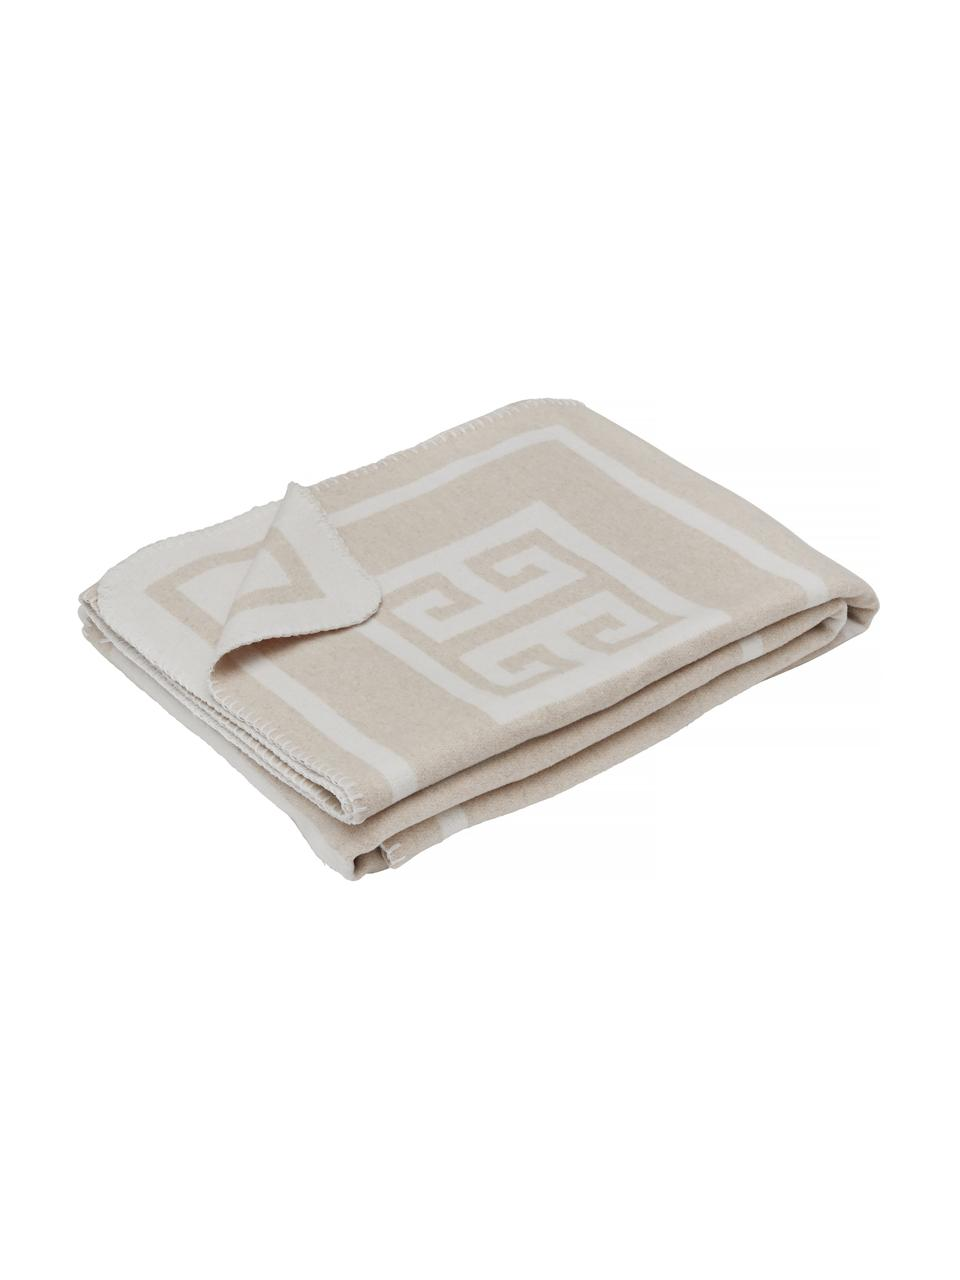 Plaid con motivo grafico beige/bianco Lugano, 100% poliestere, Sabbia, bianco latteo, Larg. 138 x Lung. 184 cm